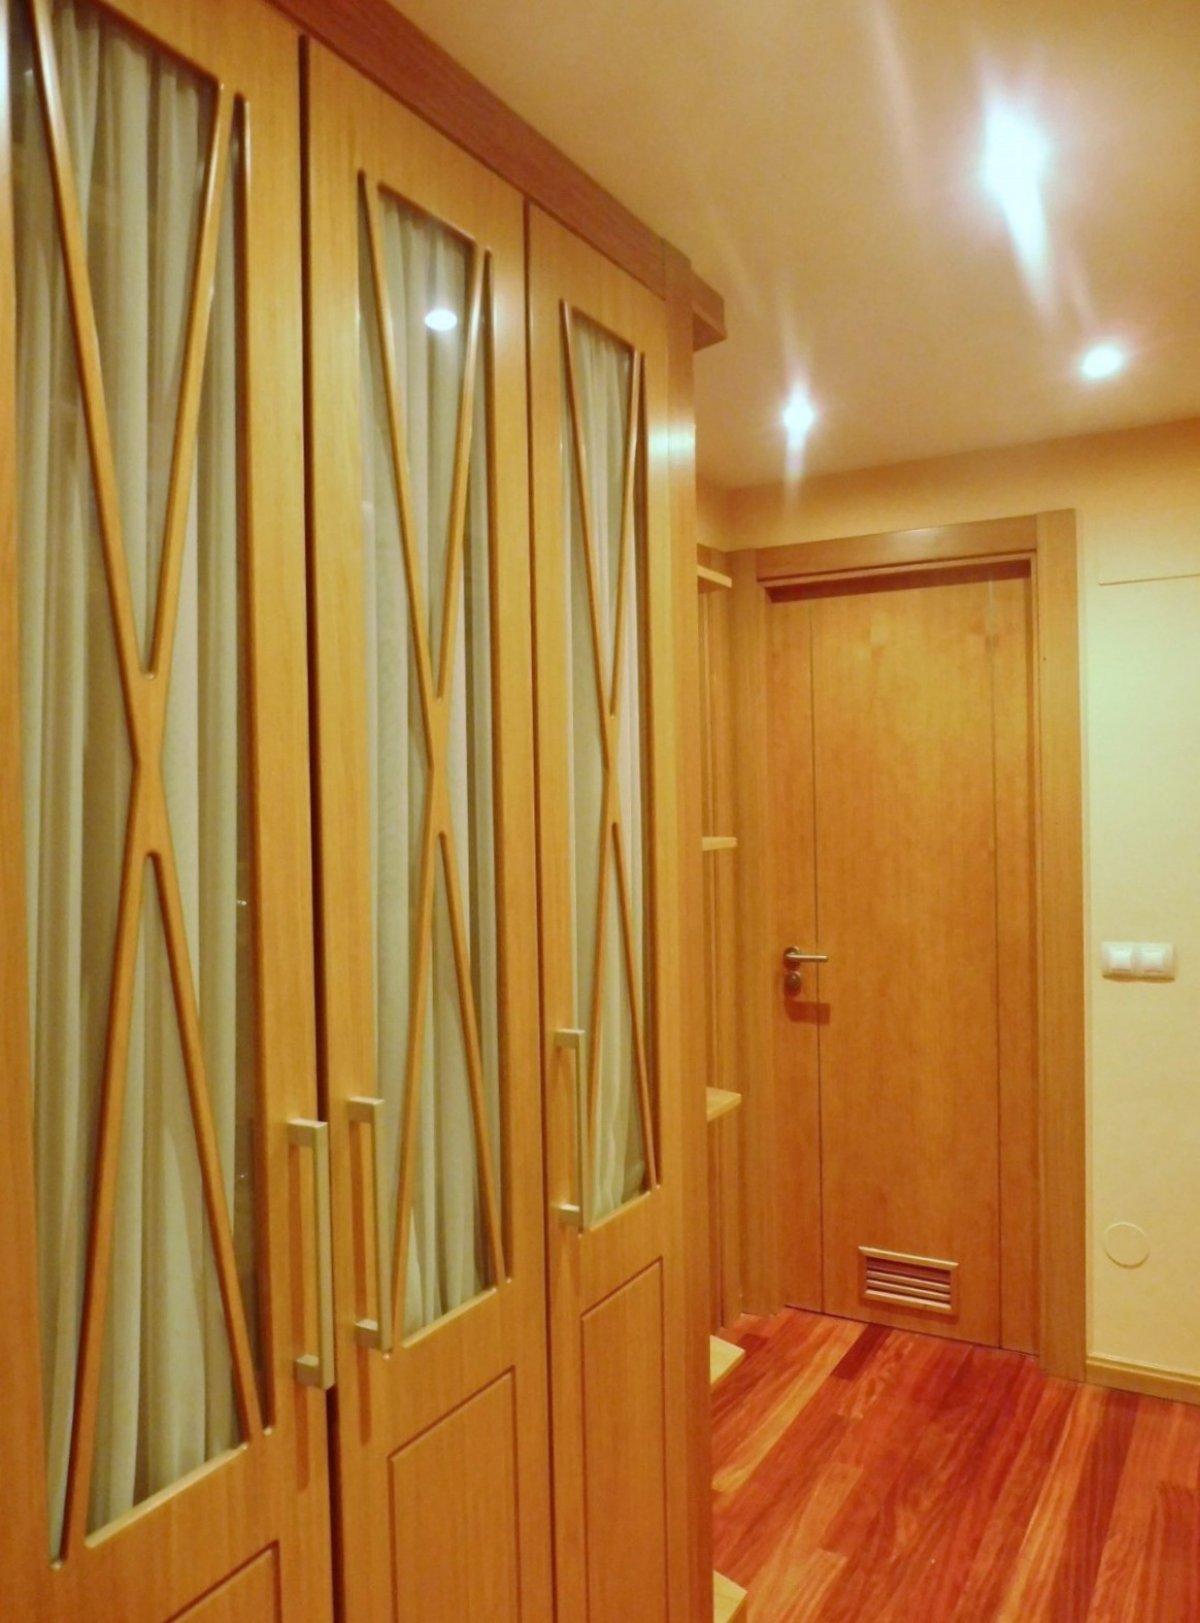 Bonito piso seminuevo - imagenInmueble17